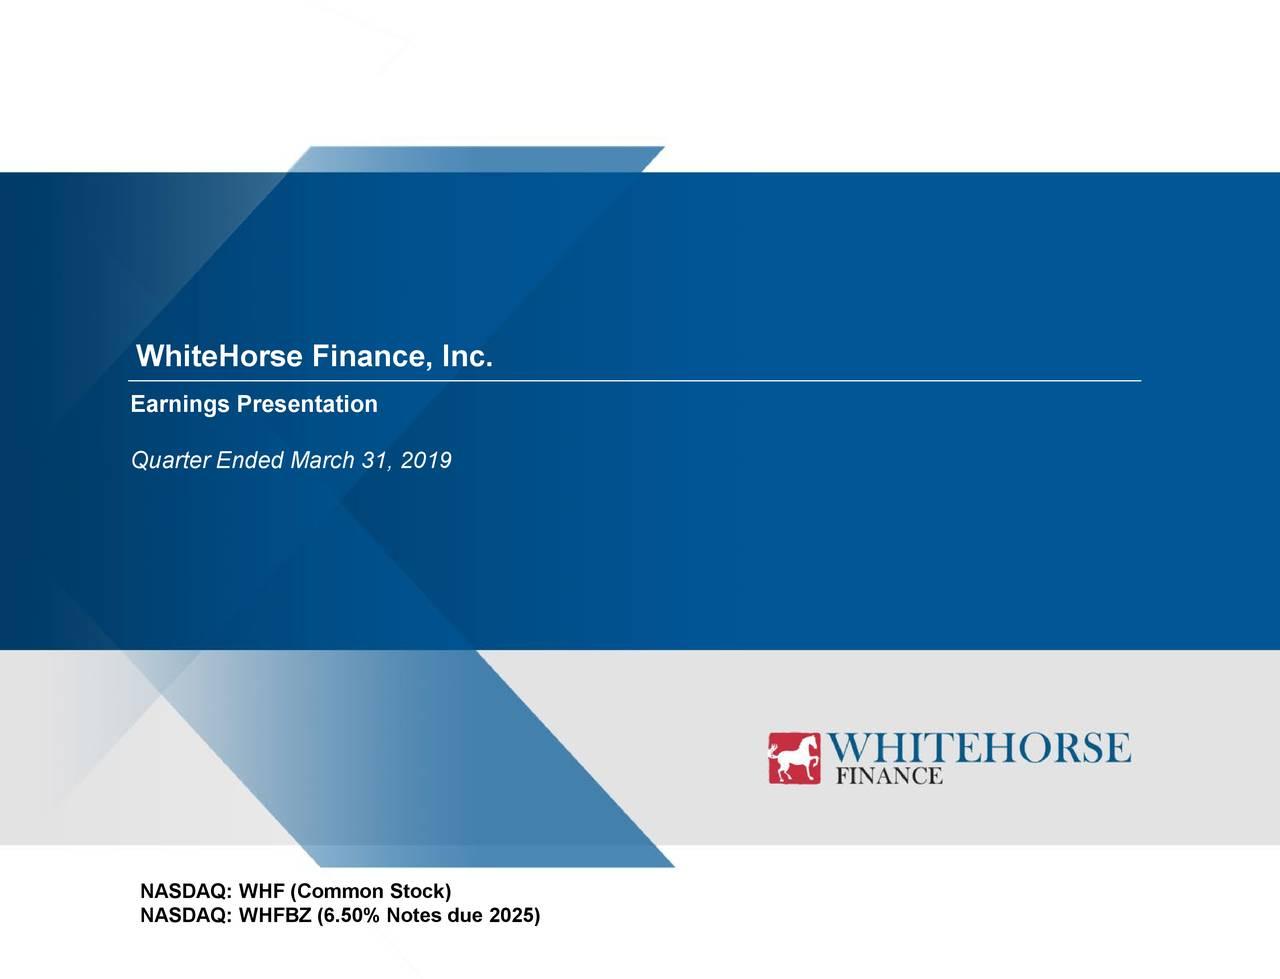 Earnings Presentation Quarter Ended March 31, 2019 NASDAQ:WHF (Common Stock) NASDAQ:WHFBZ (6.50% Notes due 2025)